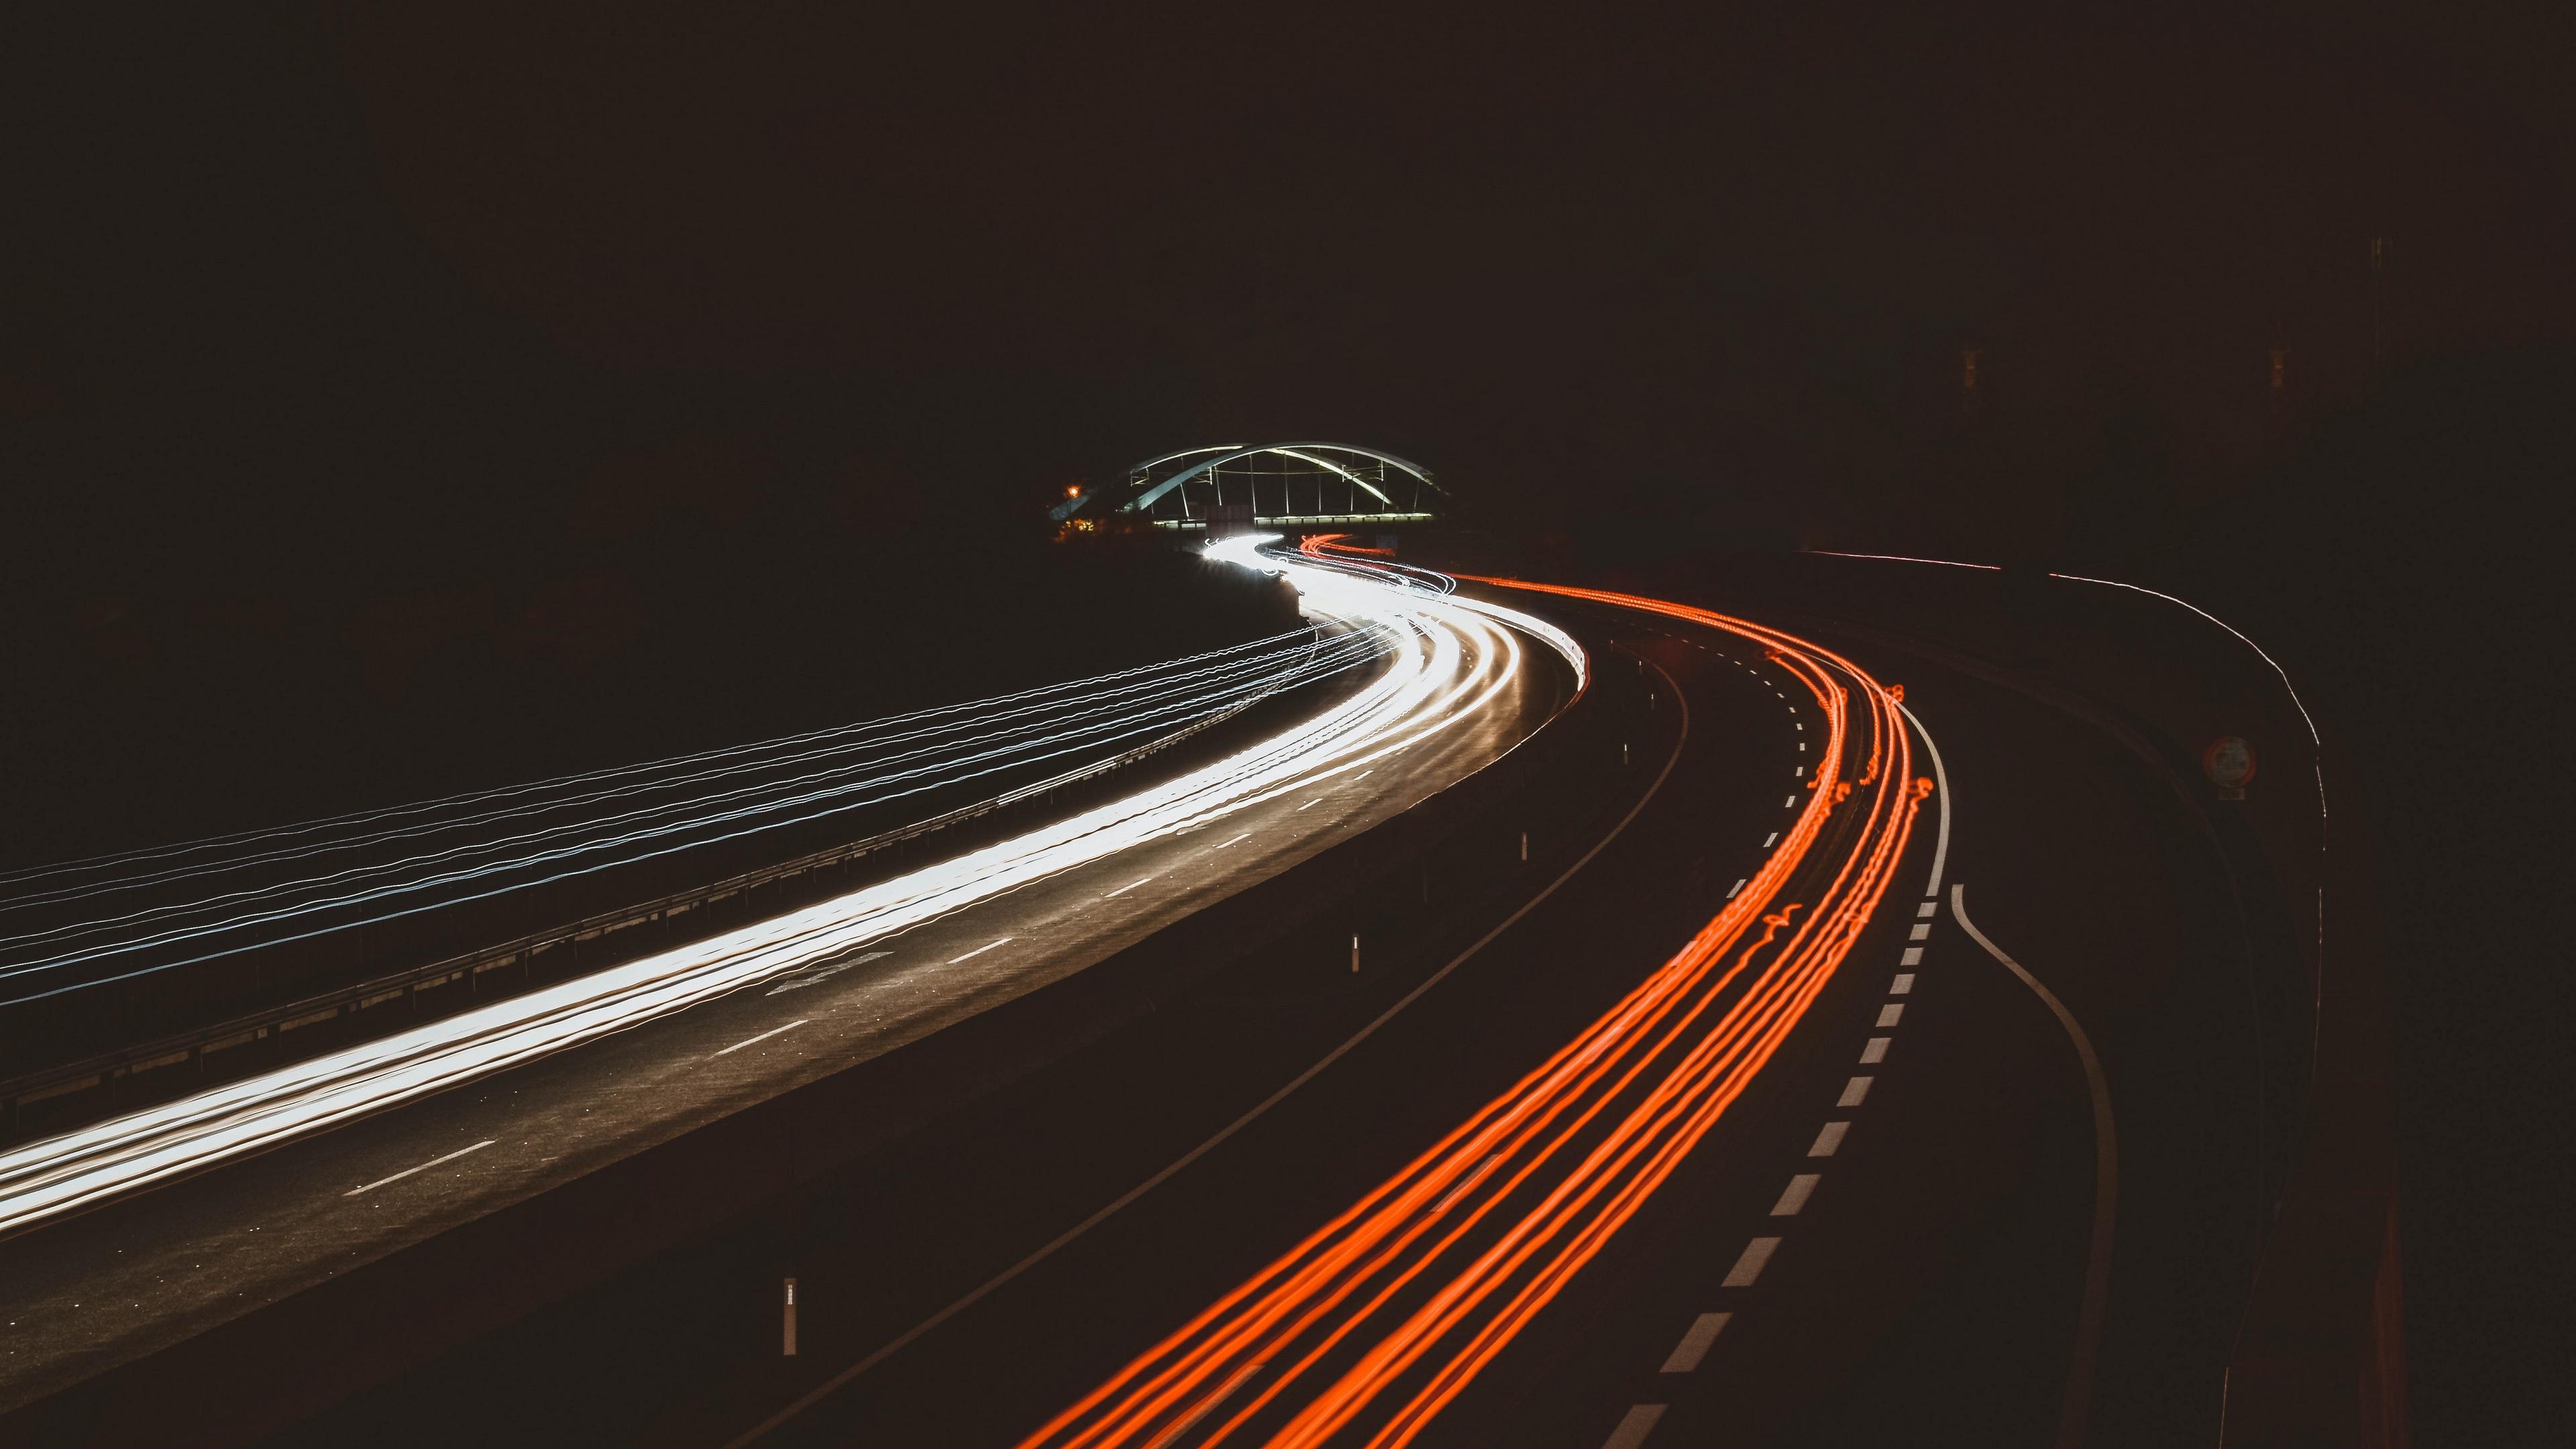 road turn light night 4k 1538065540 - road, turn, light, night 4k - turn, Road, Light